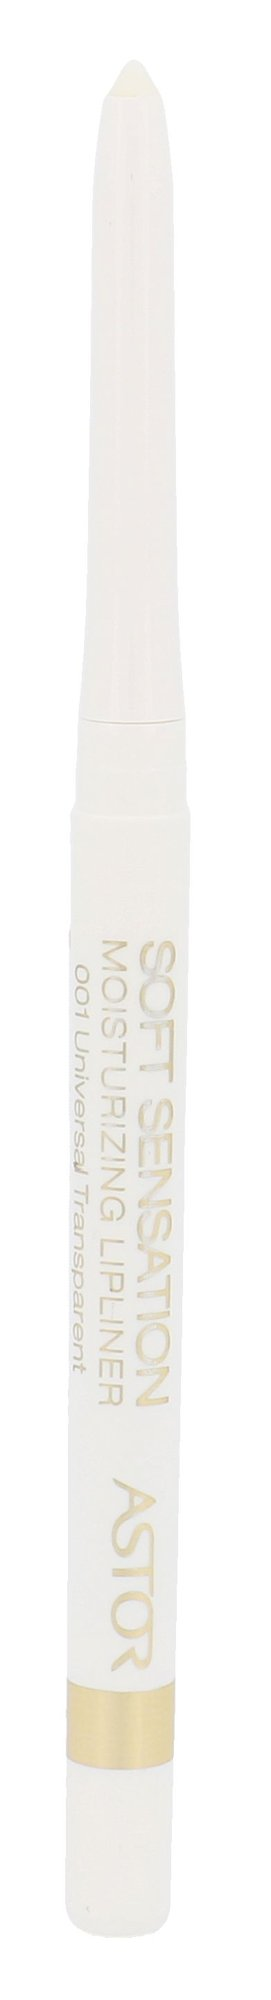 ASTOR Soft Sensation Cosmetic 4ml 001 Universal Transparent